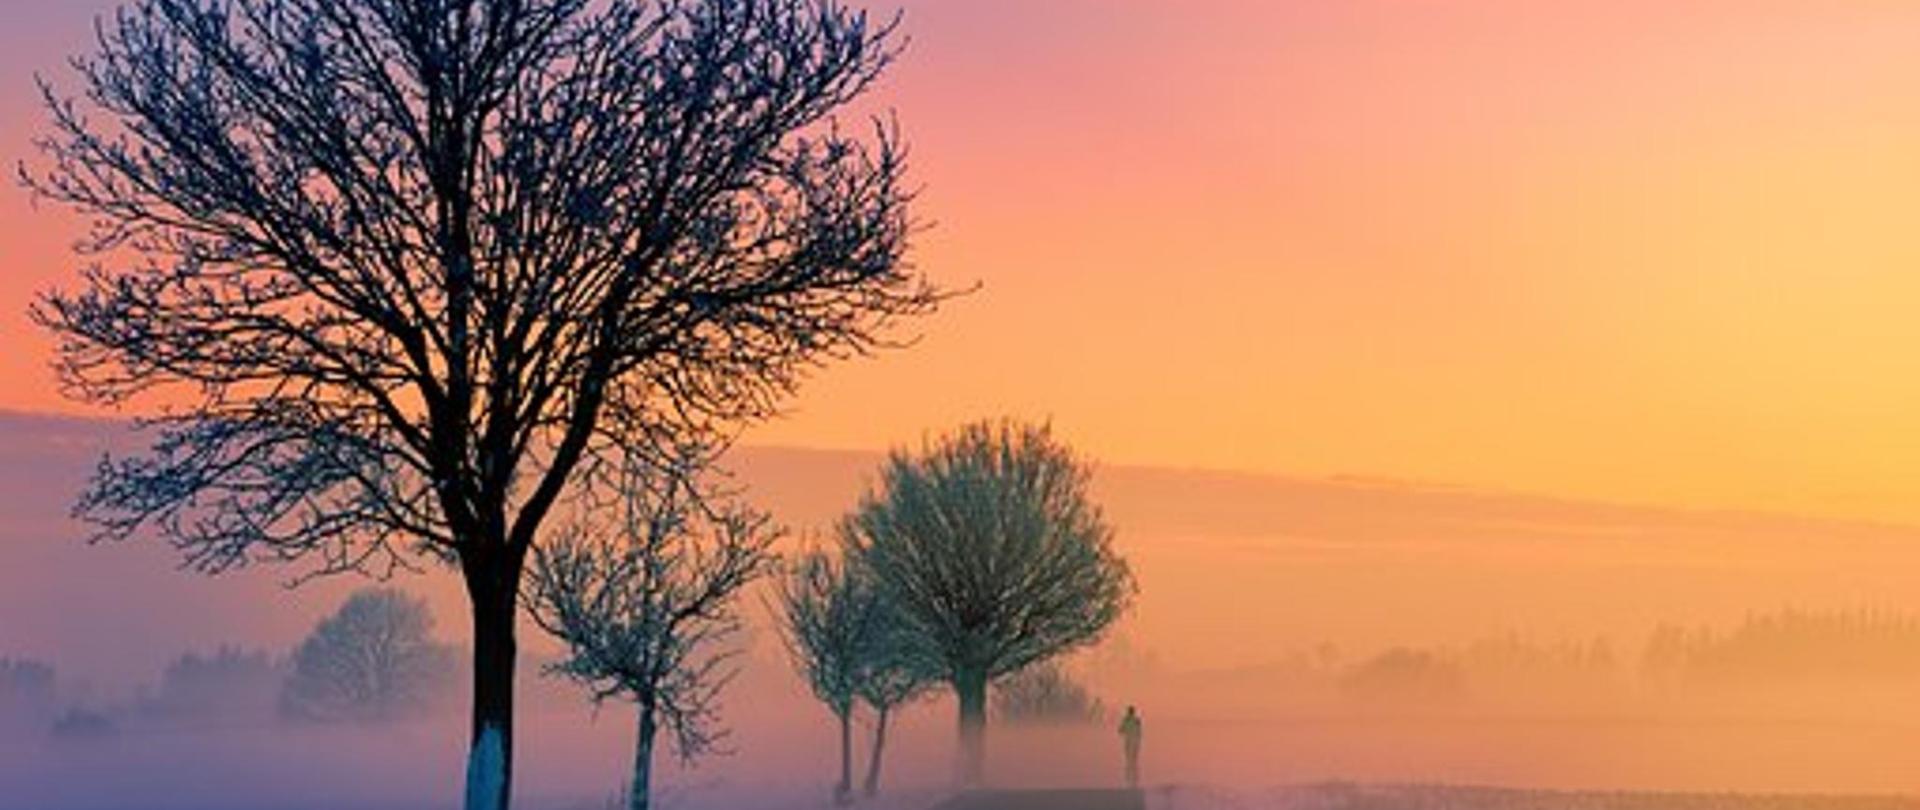 winter-3197686__340.jpg